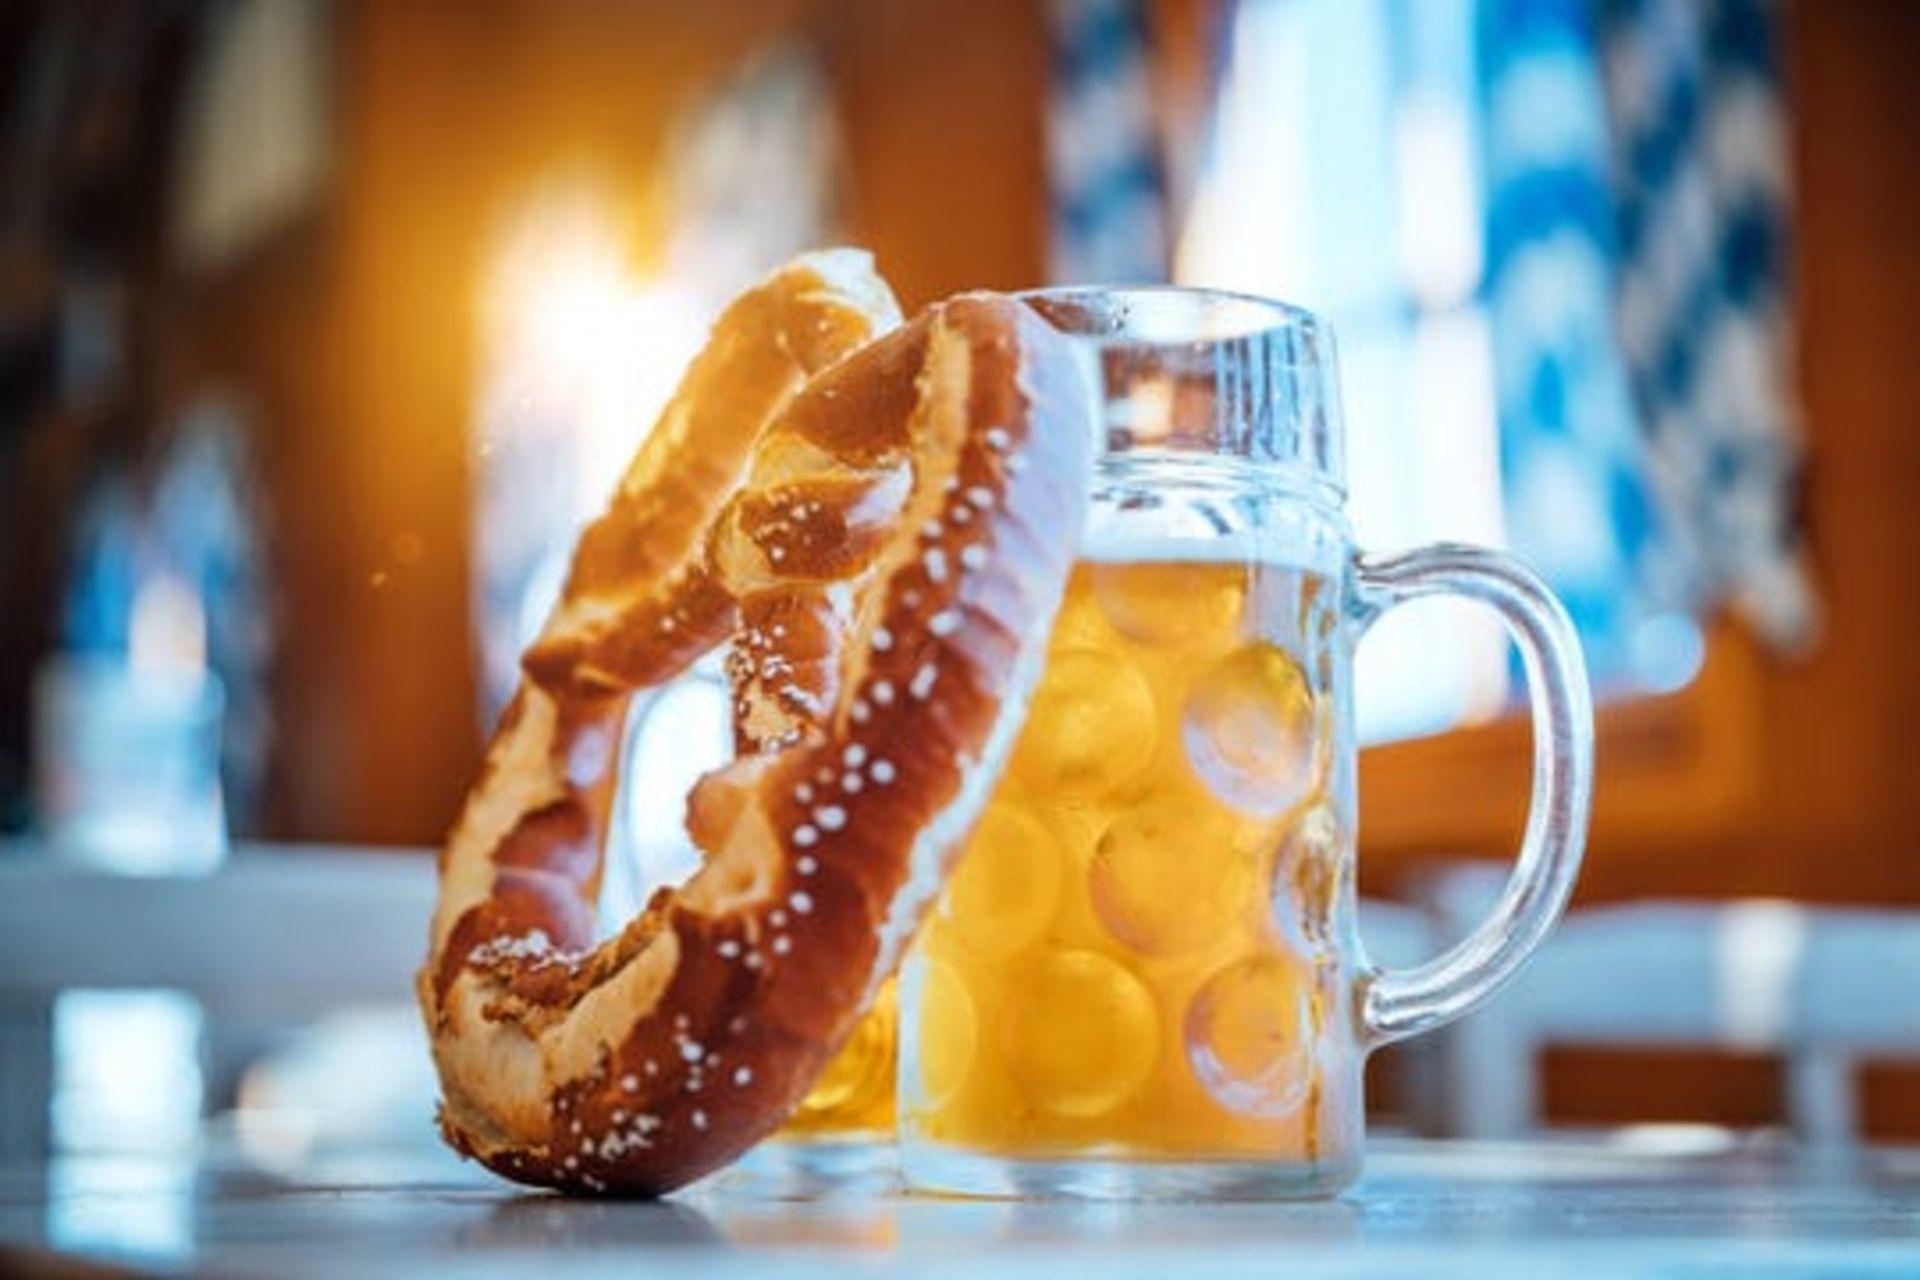 Looking for German food and beer for Oktoberfest? Brevard has plenty to offer